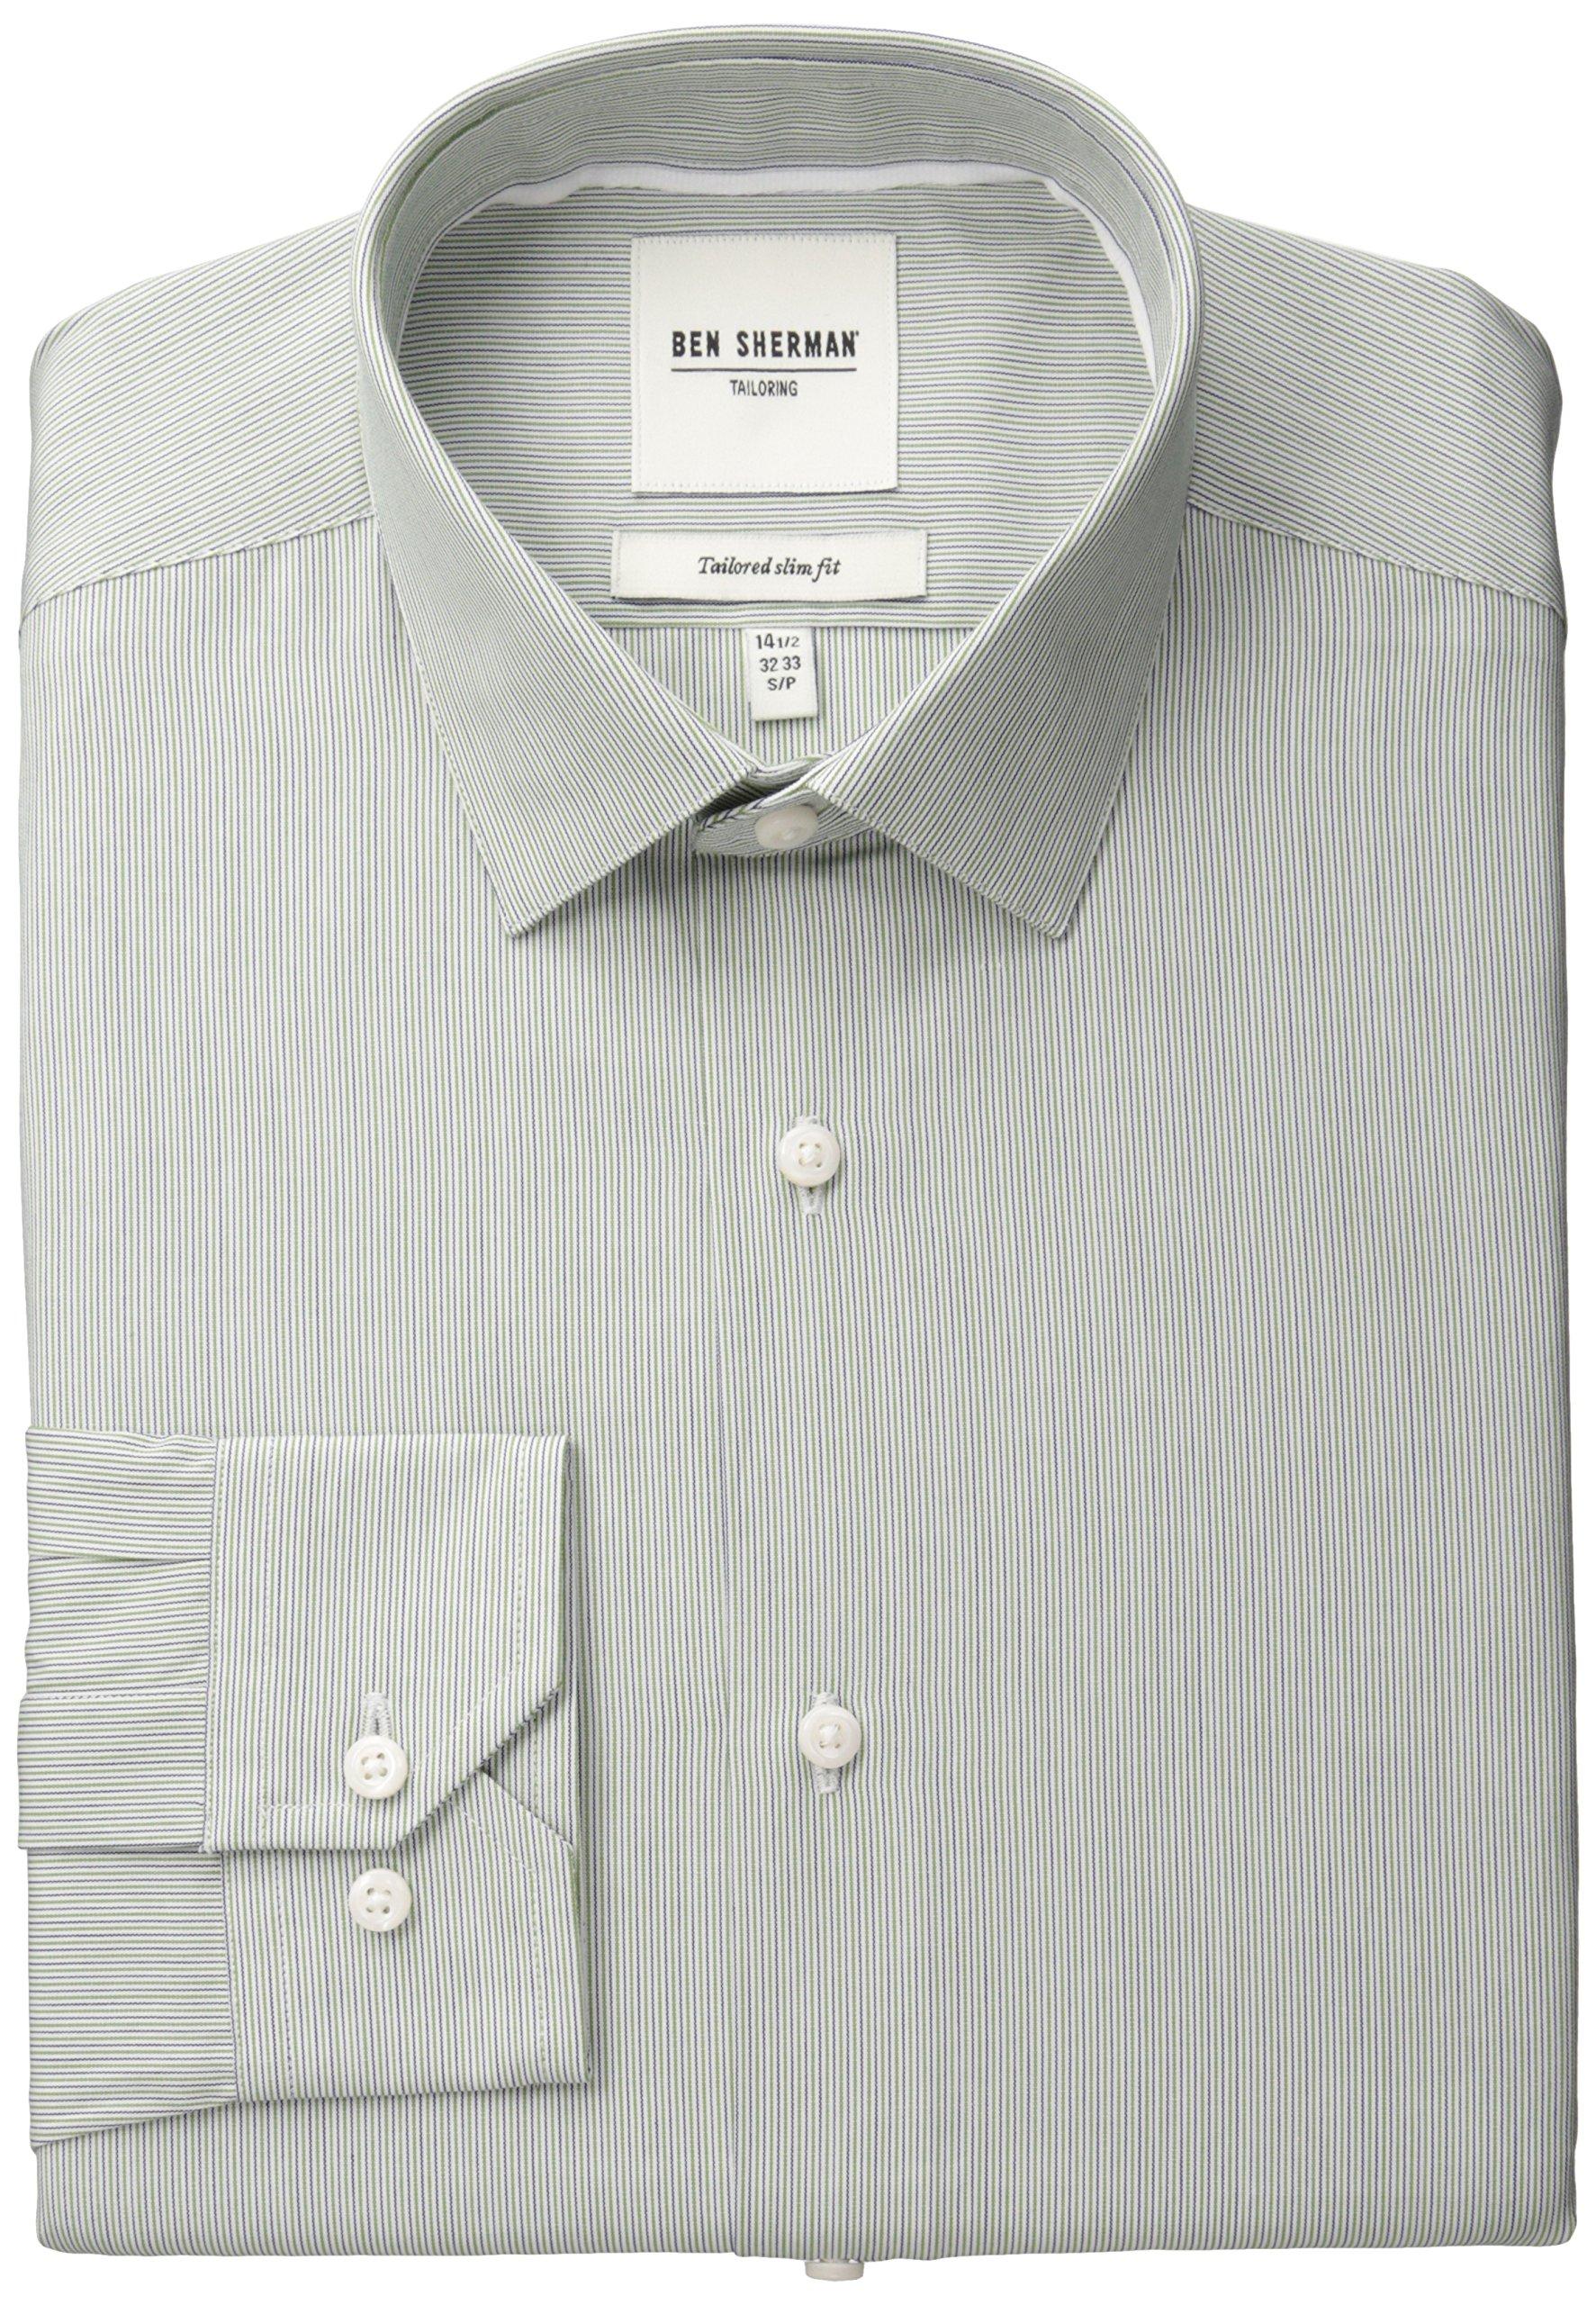 Ben Sherman Men's Slim Fit Fineline Stripe Spread Collar Dress Shirt, Green, 16'' Neck 34''-35'' Sleeve